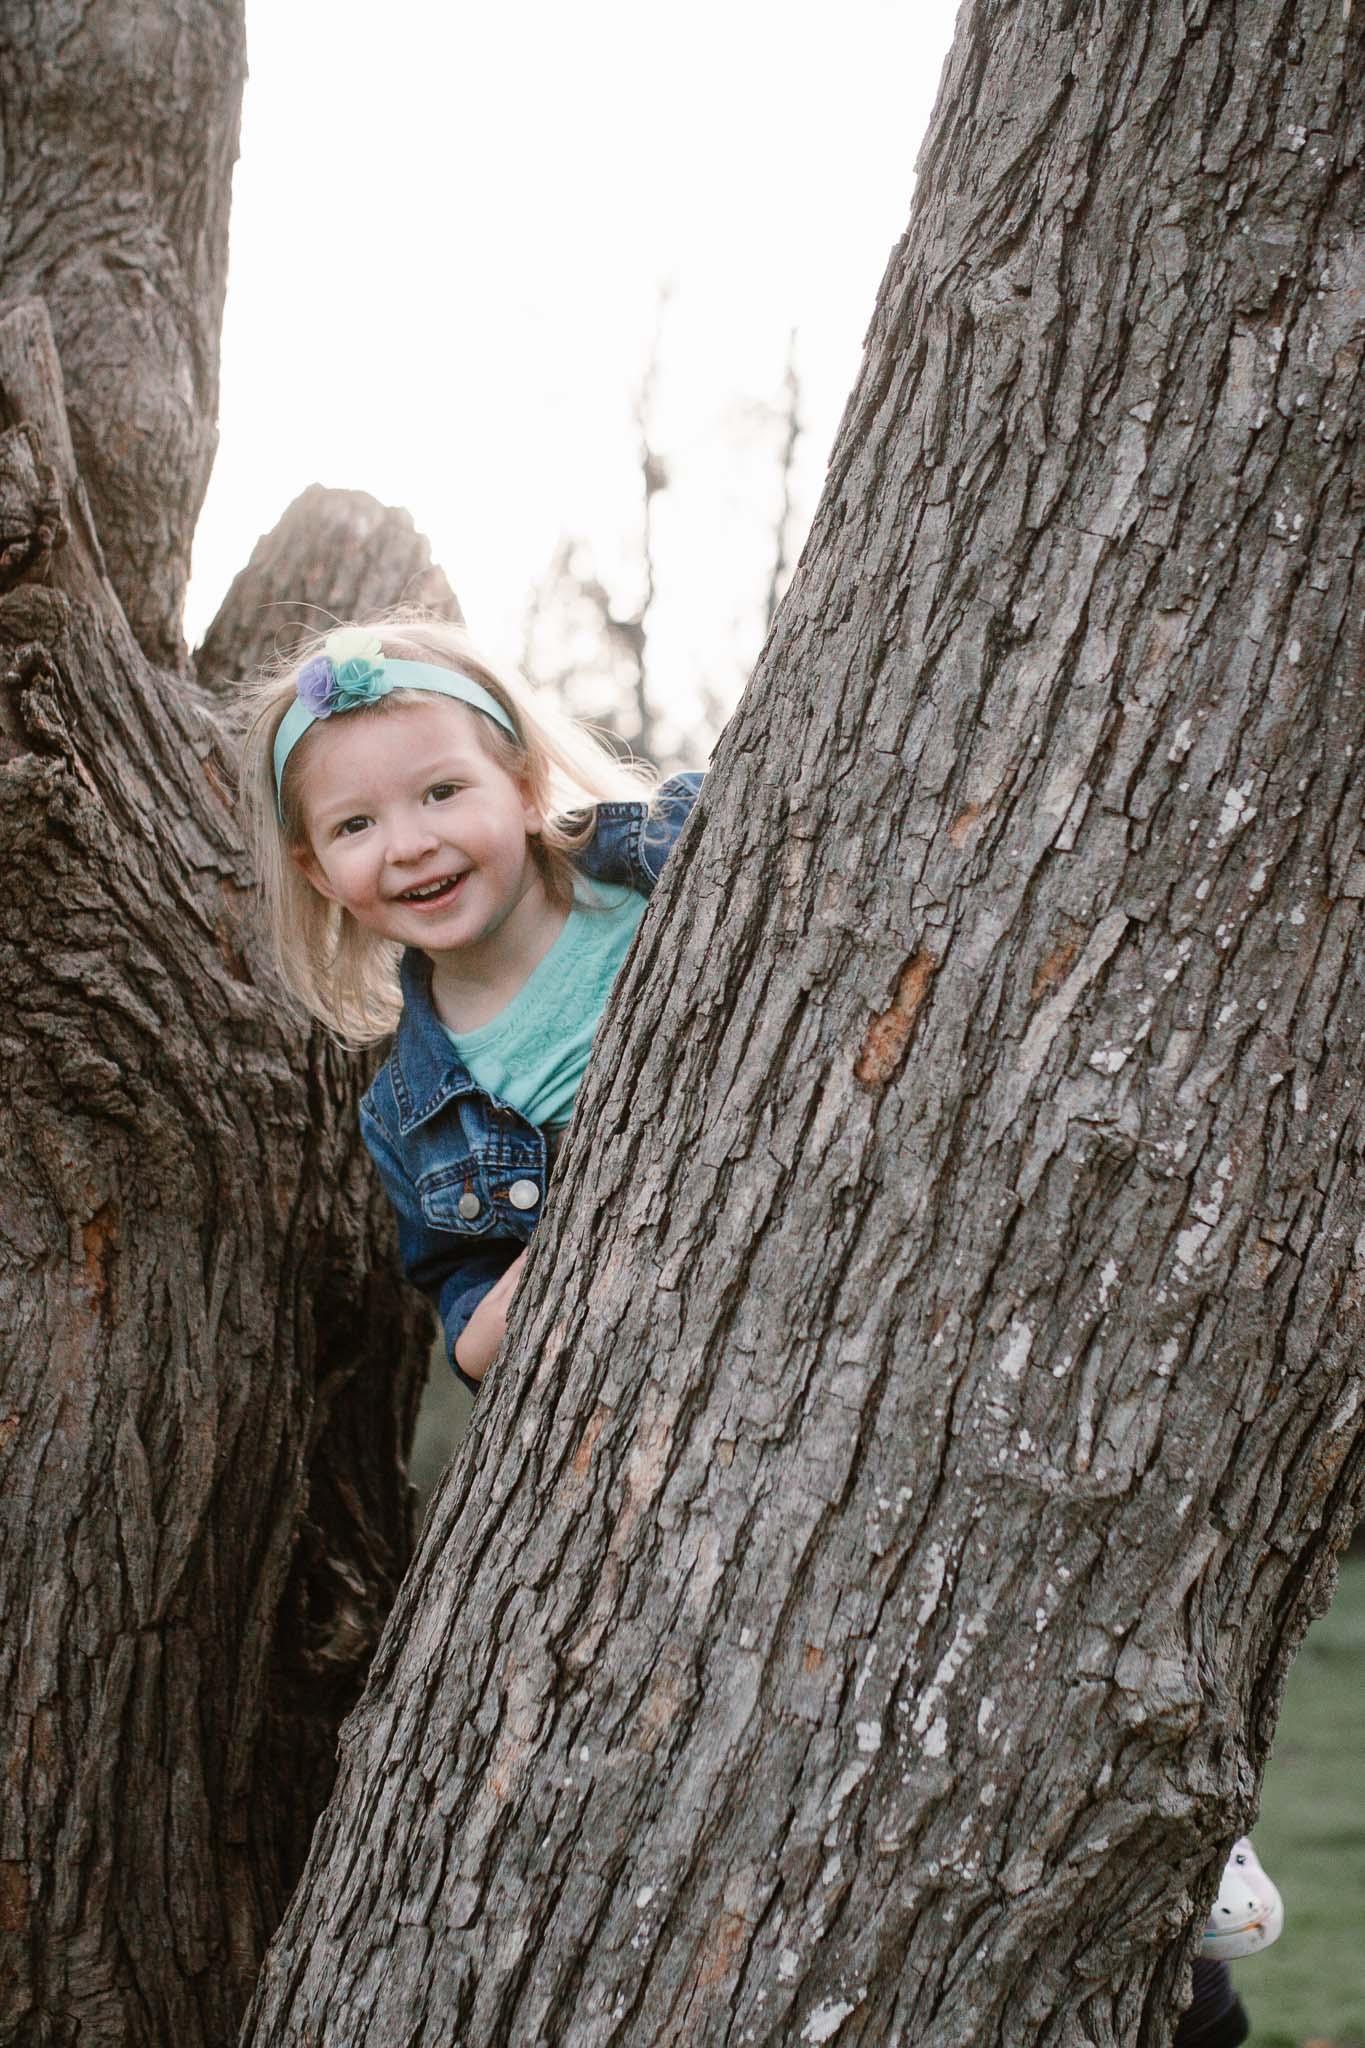 Little girl climbing a tree at Red Rock Overlook in Leesburg, VA